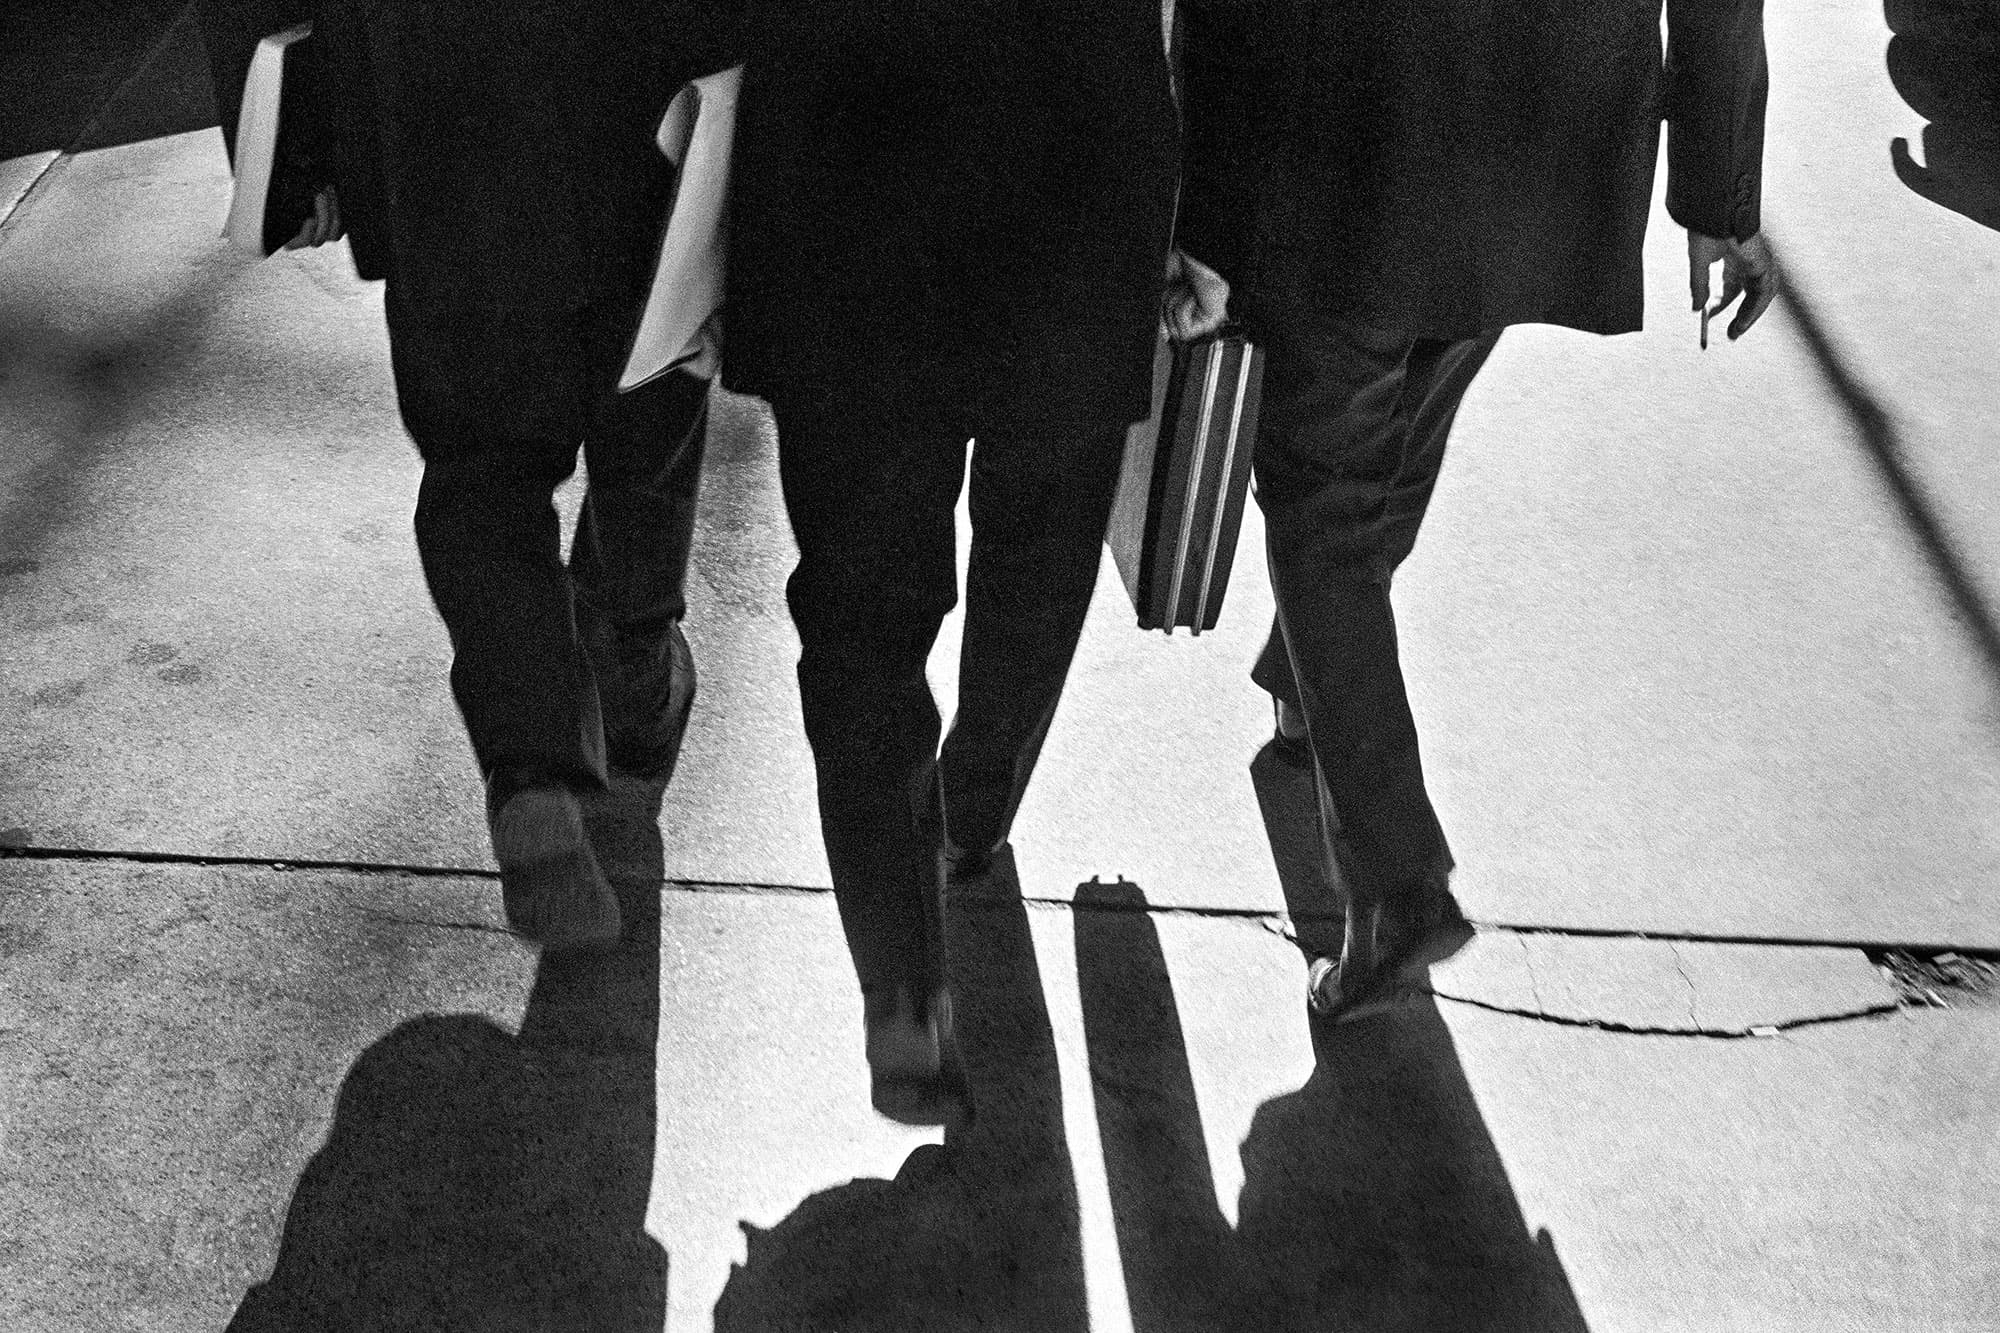 Trio-1978 arthur lazar